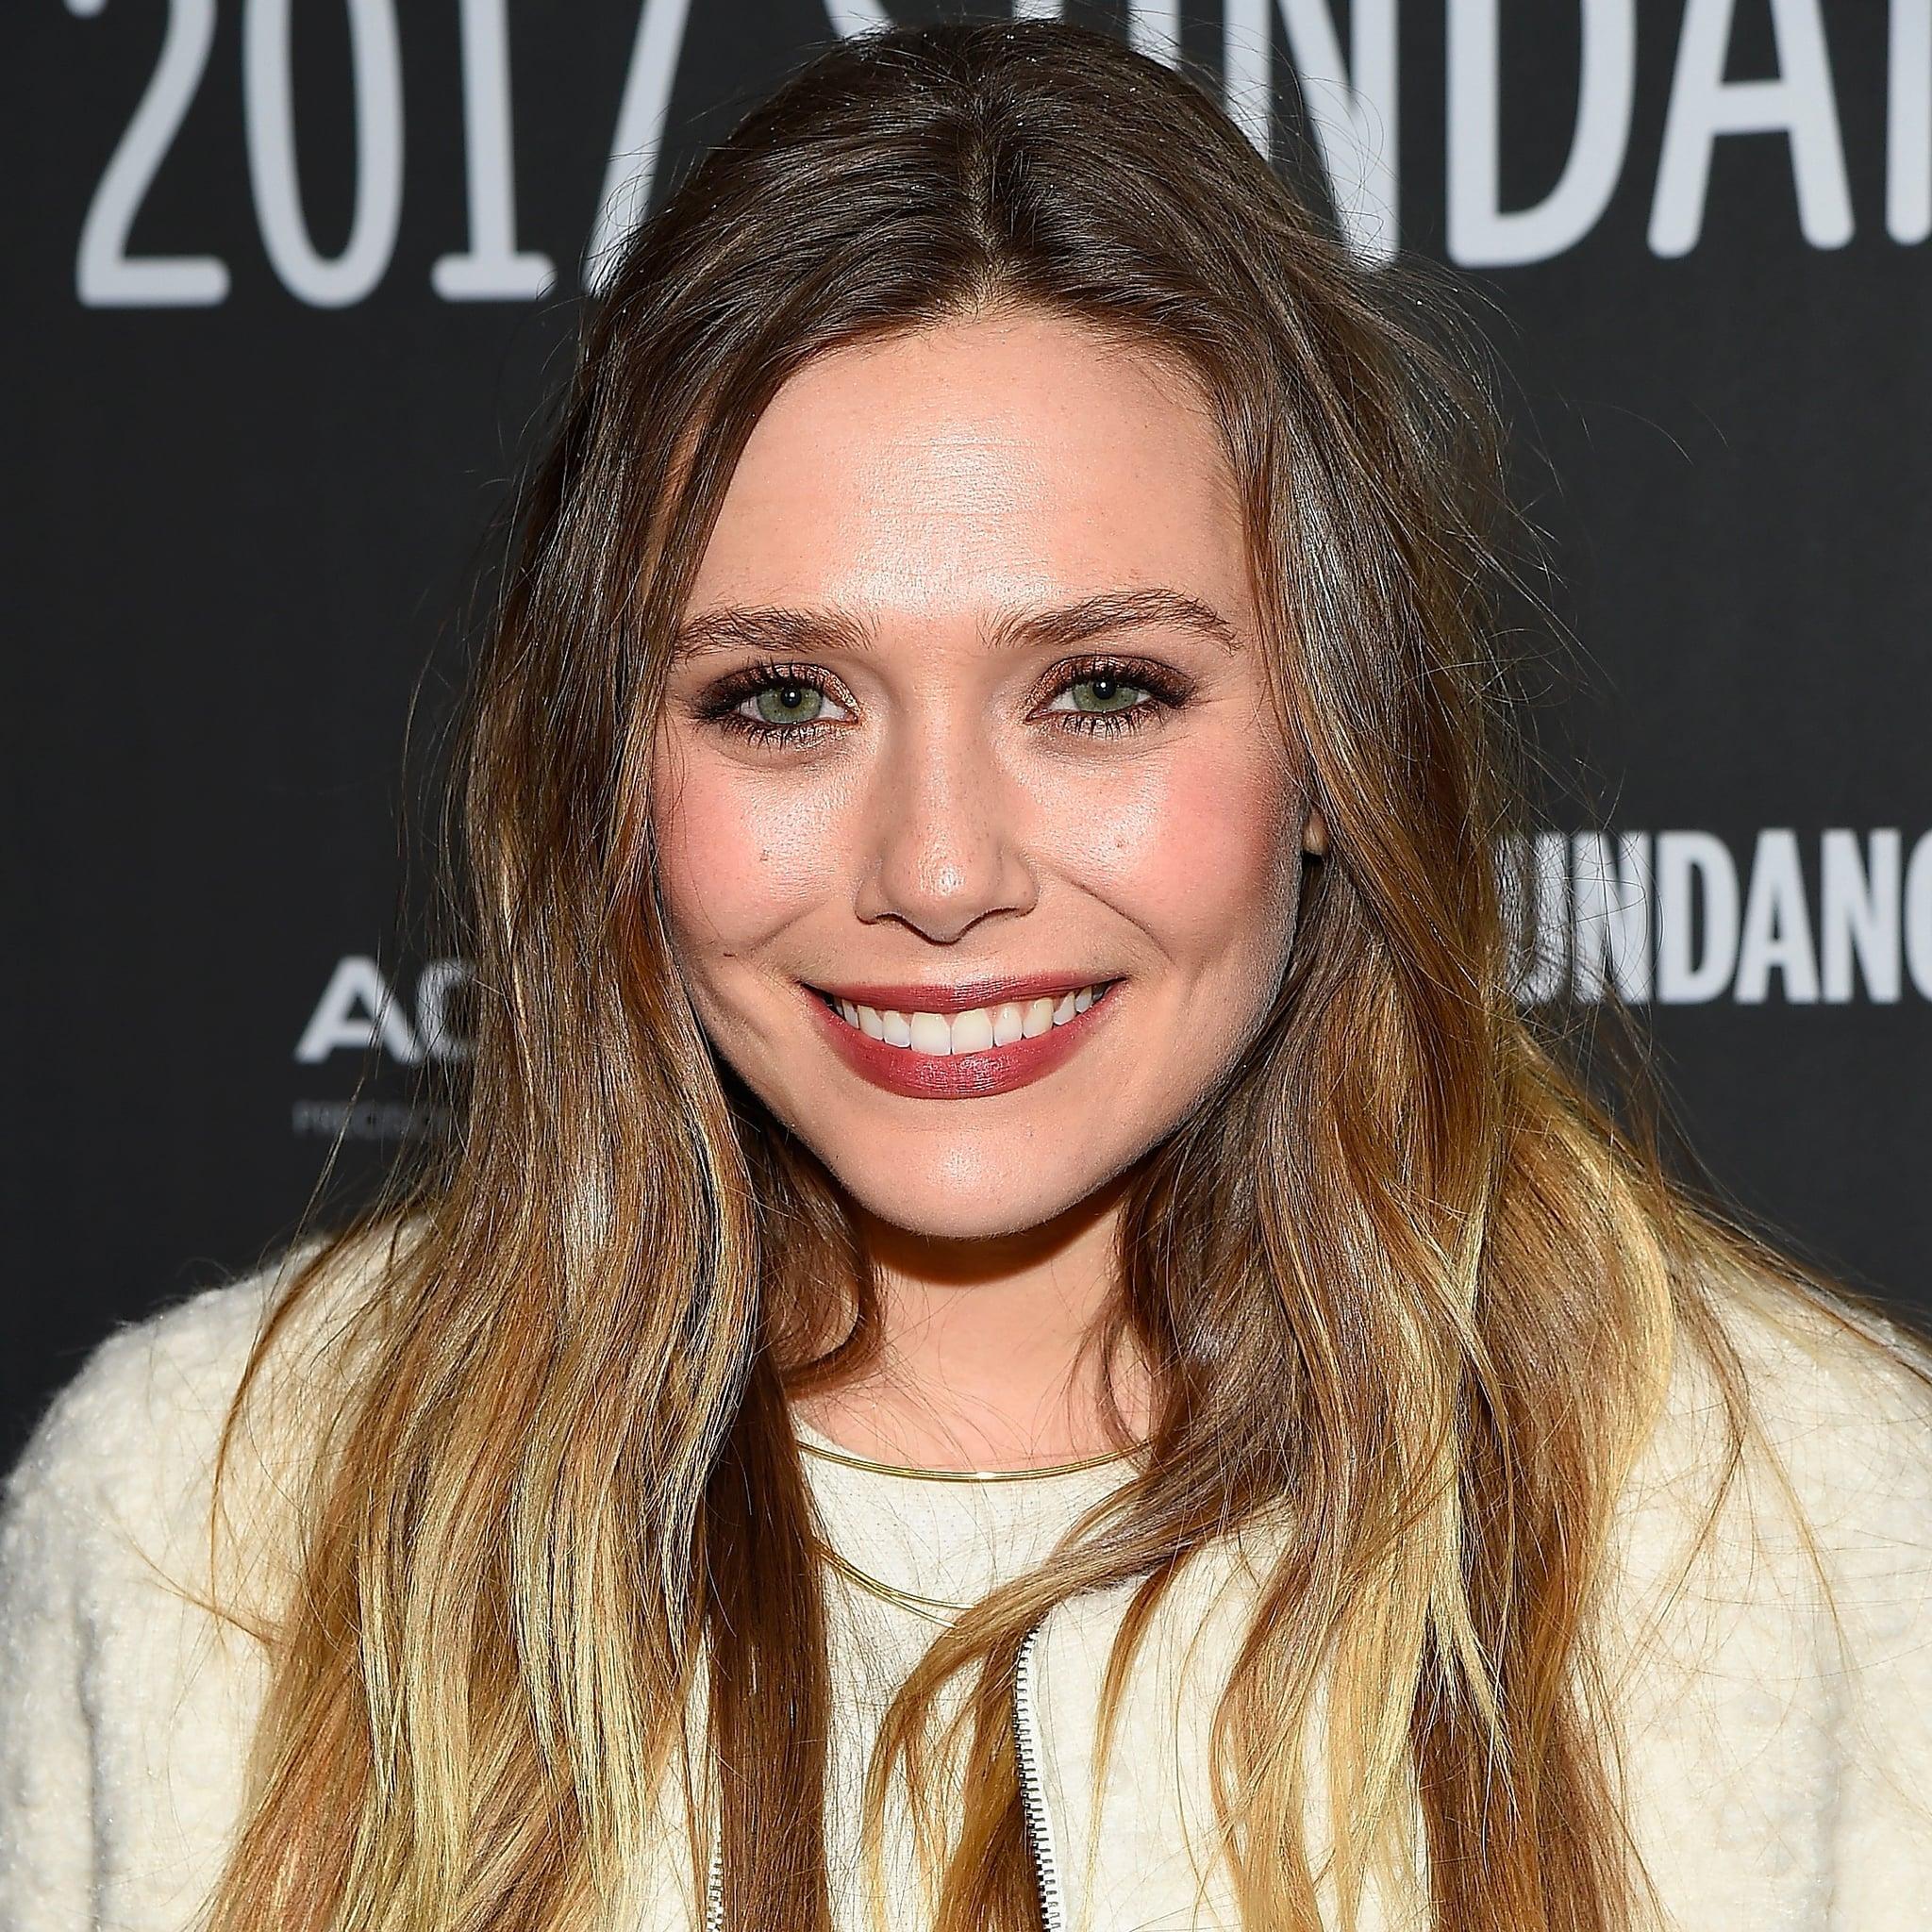 Sundance Film Festival Hair And Makeup 2017 Popsugar Beauty Australia